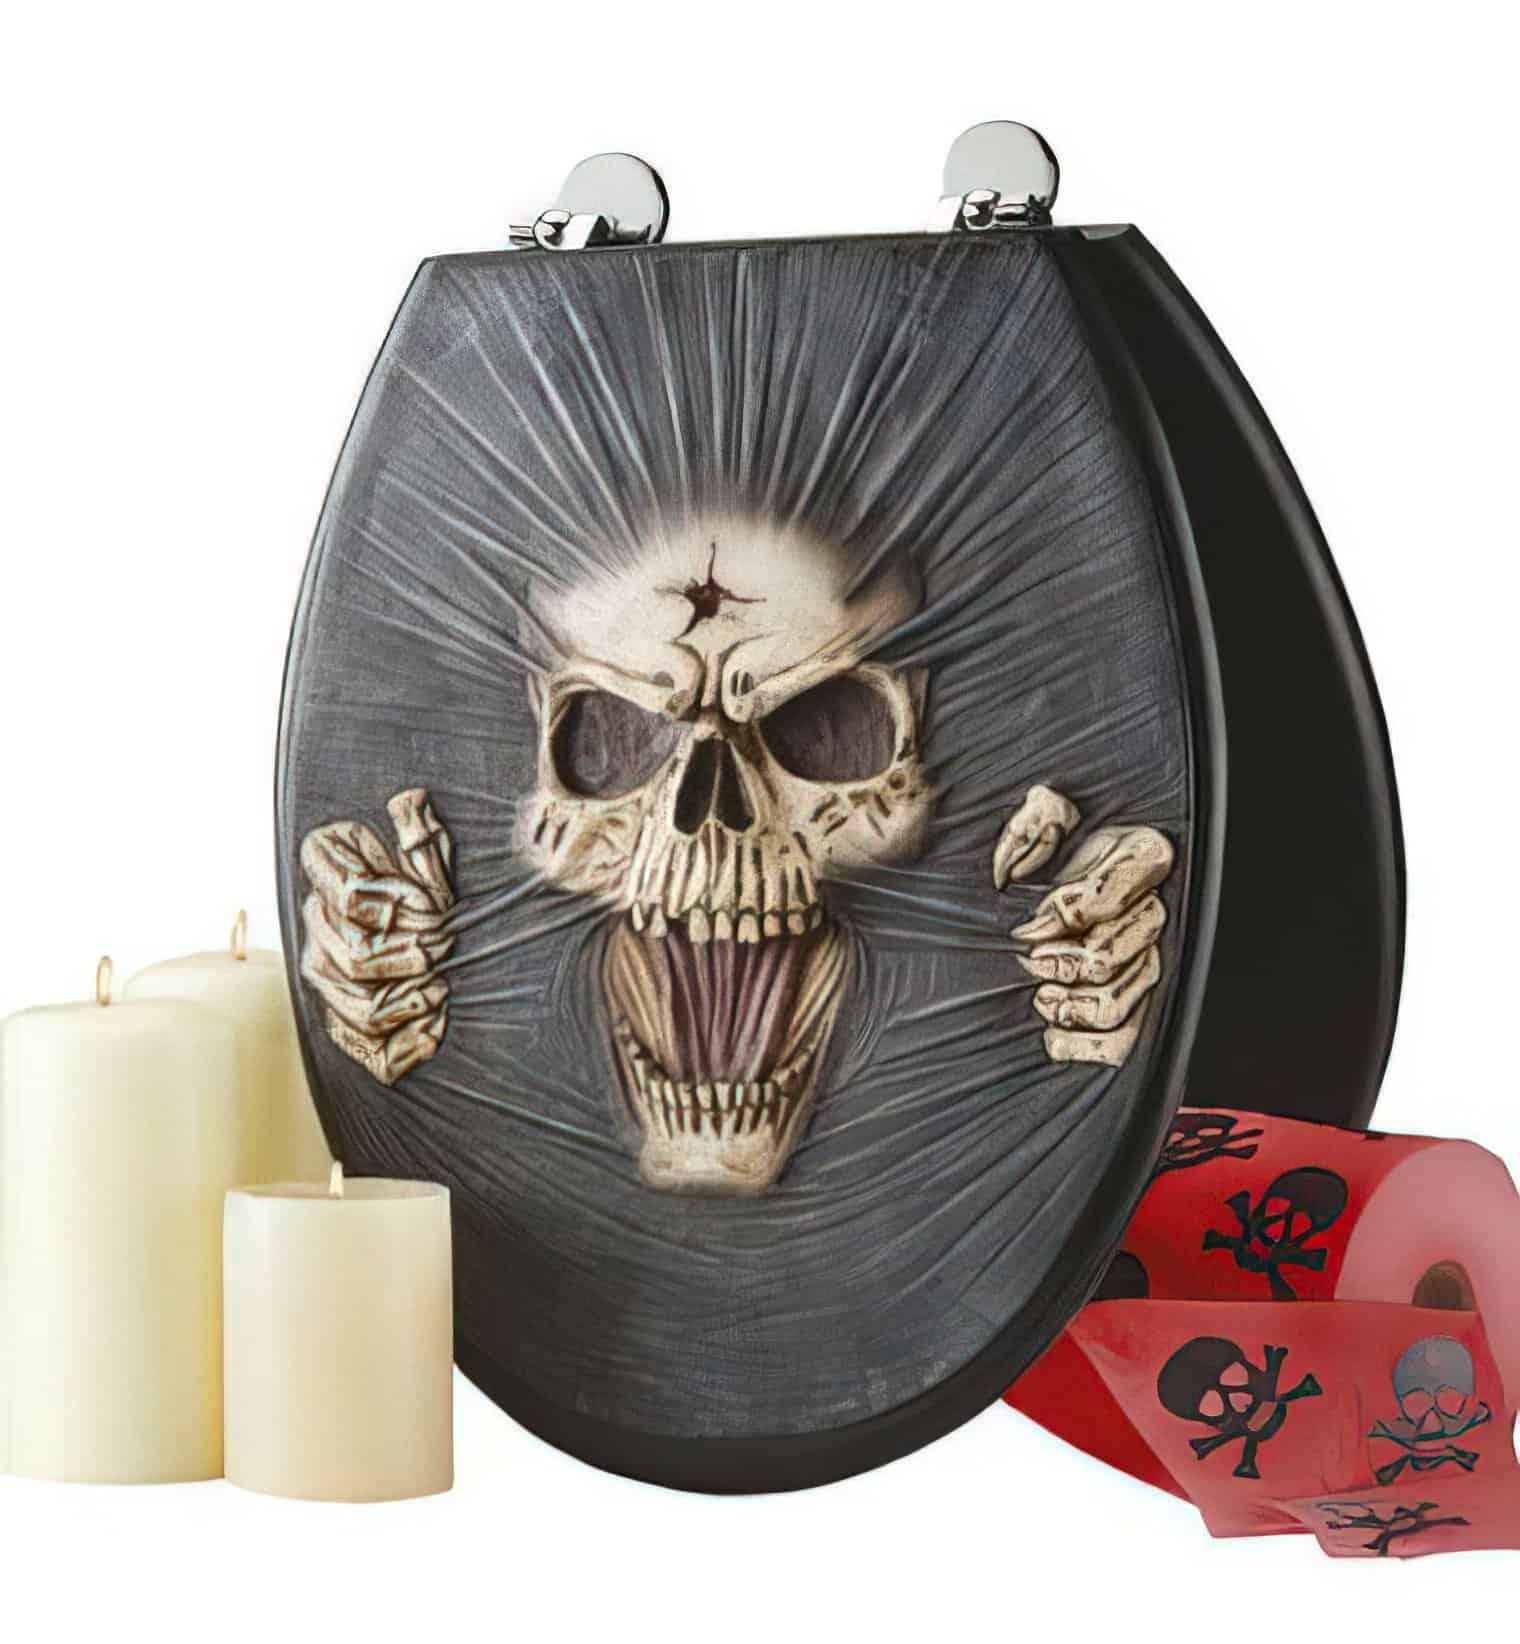 screaming skull toilet seat cover